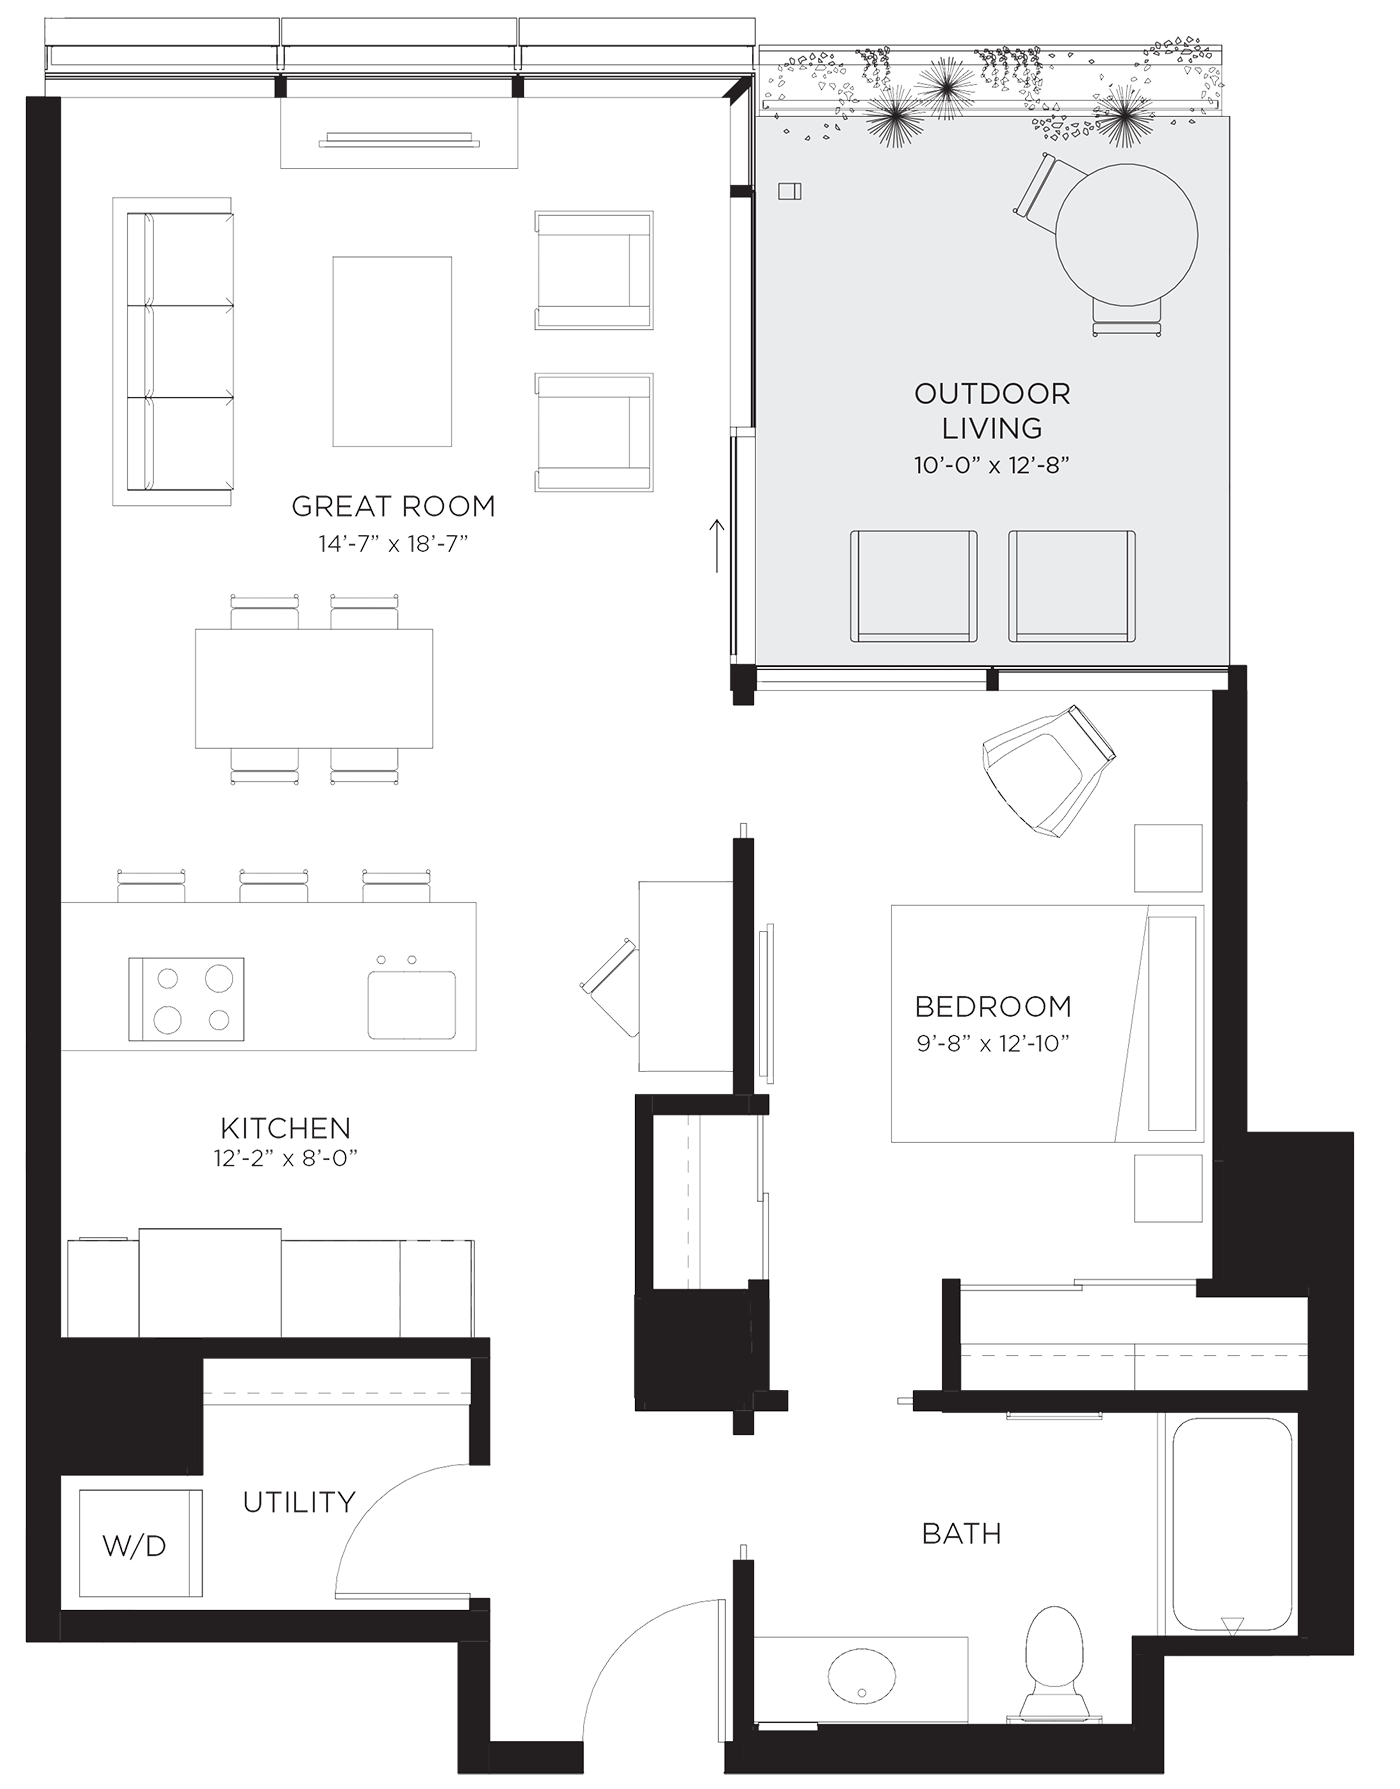 Unit 01Ab Floor Plan